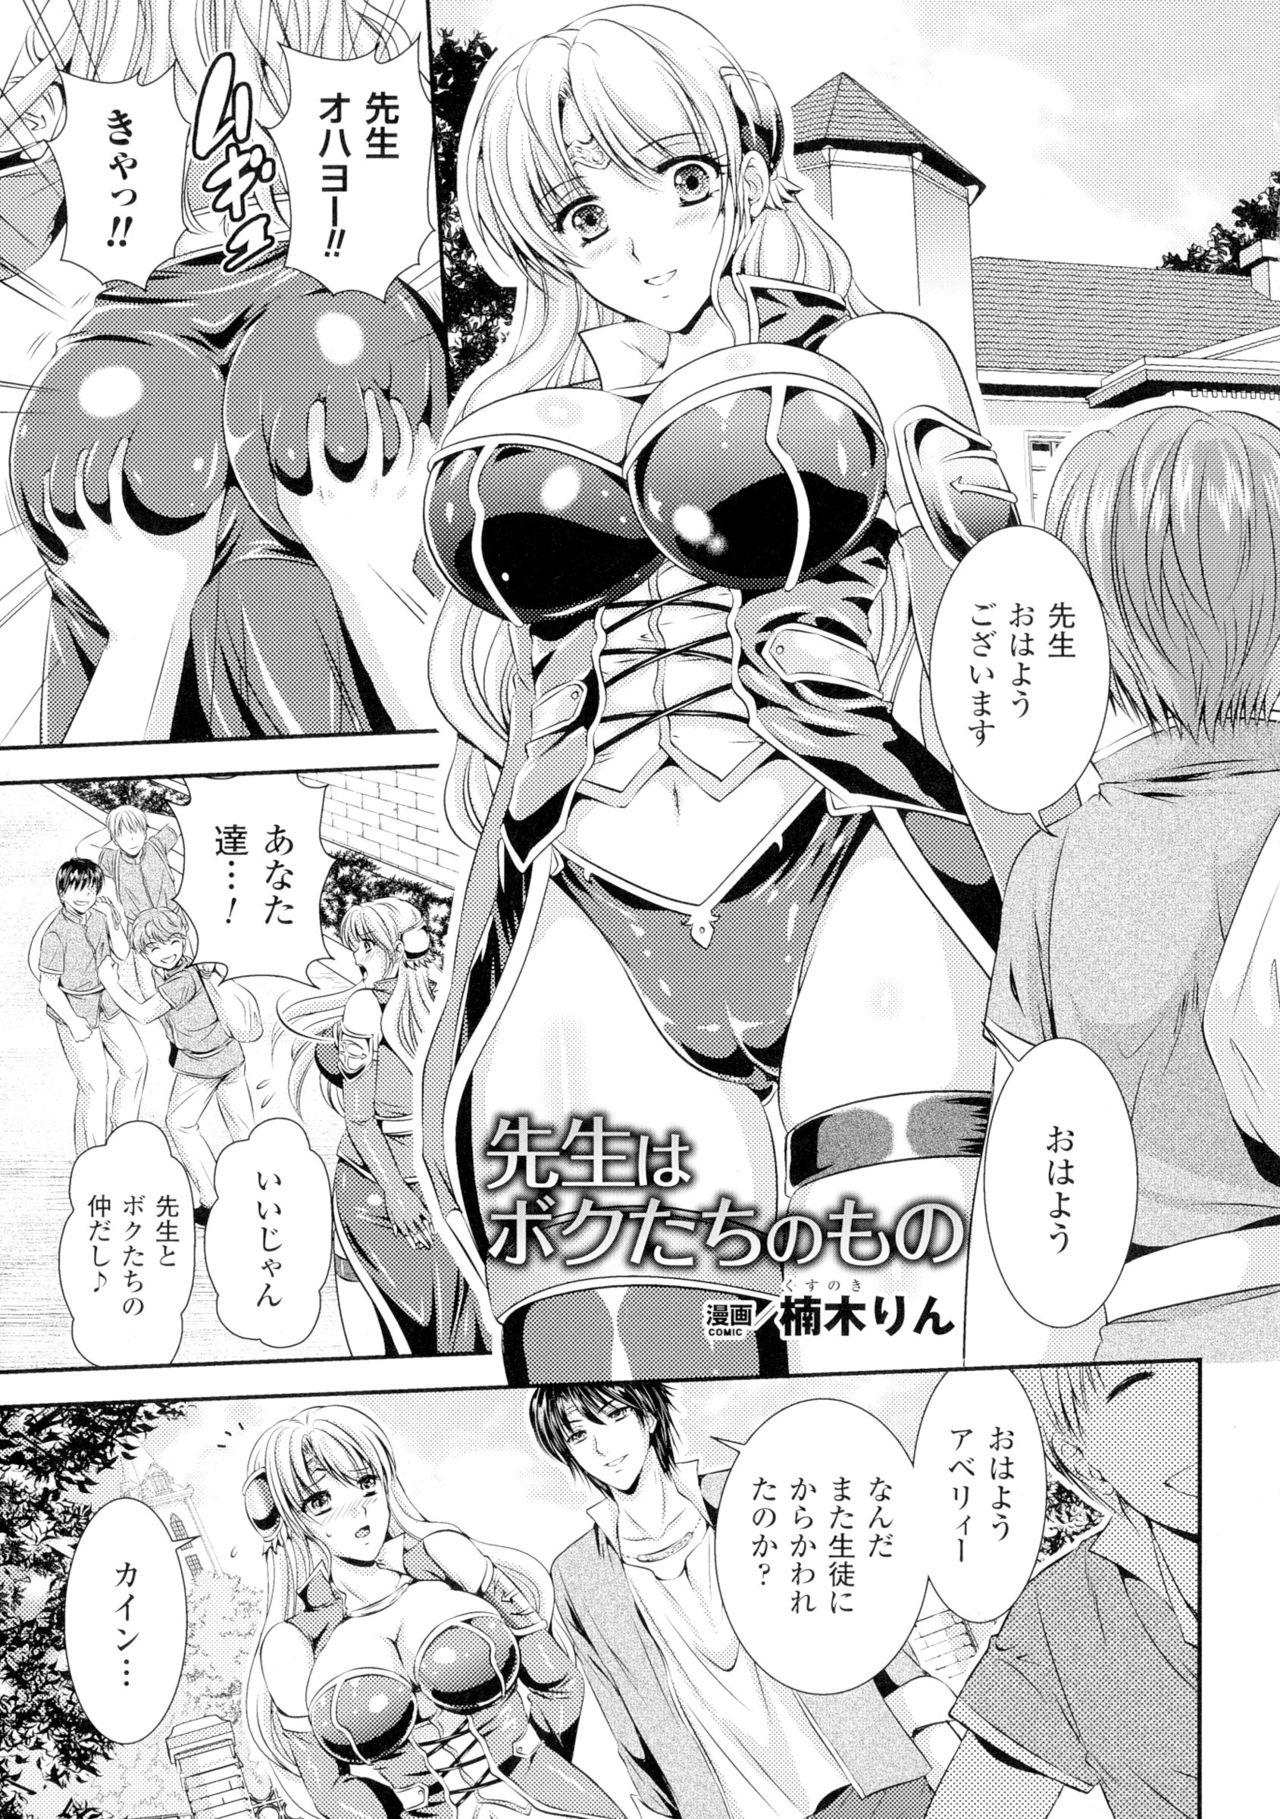 Seigi no Heroine Kangoku File DX Vol. 1 198